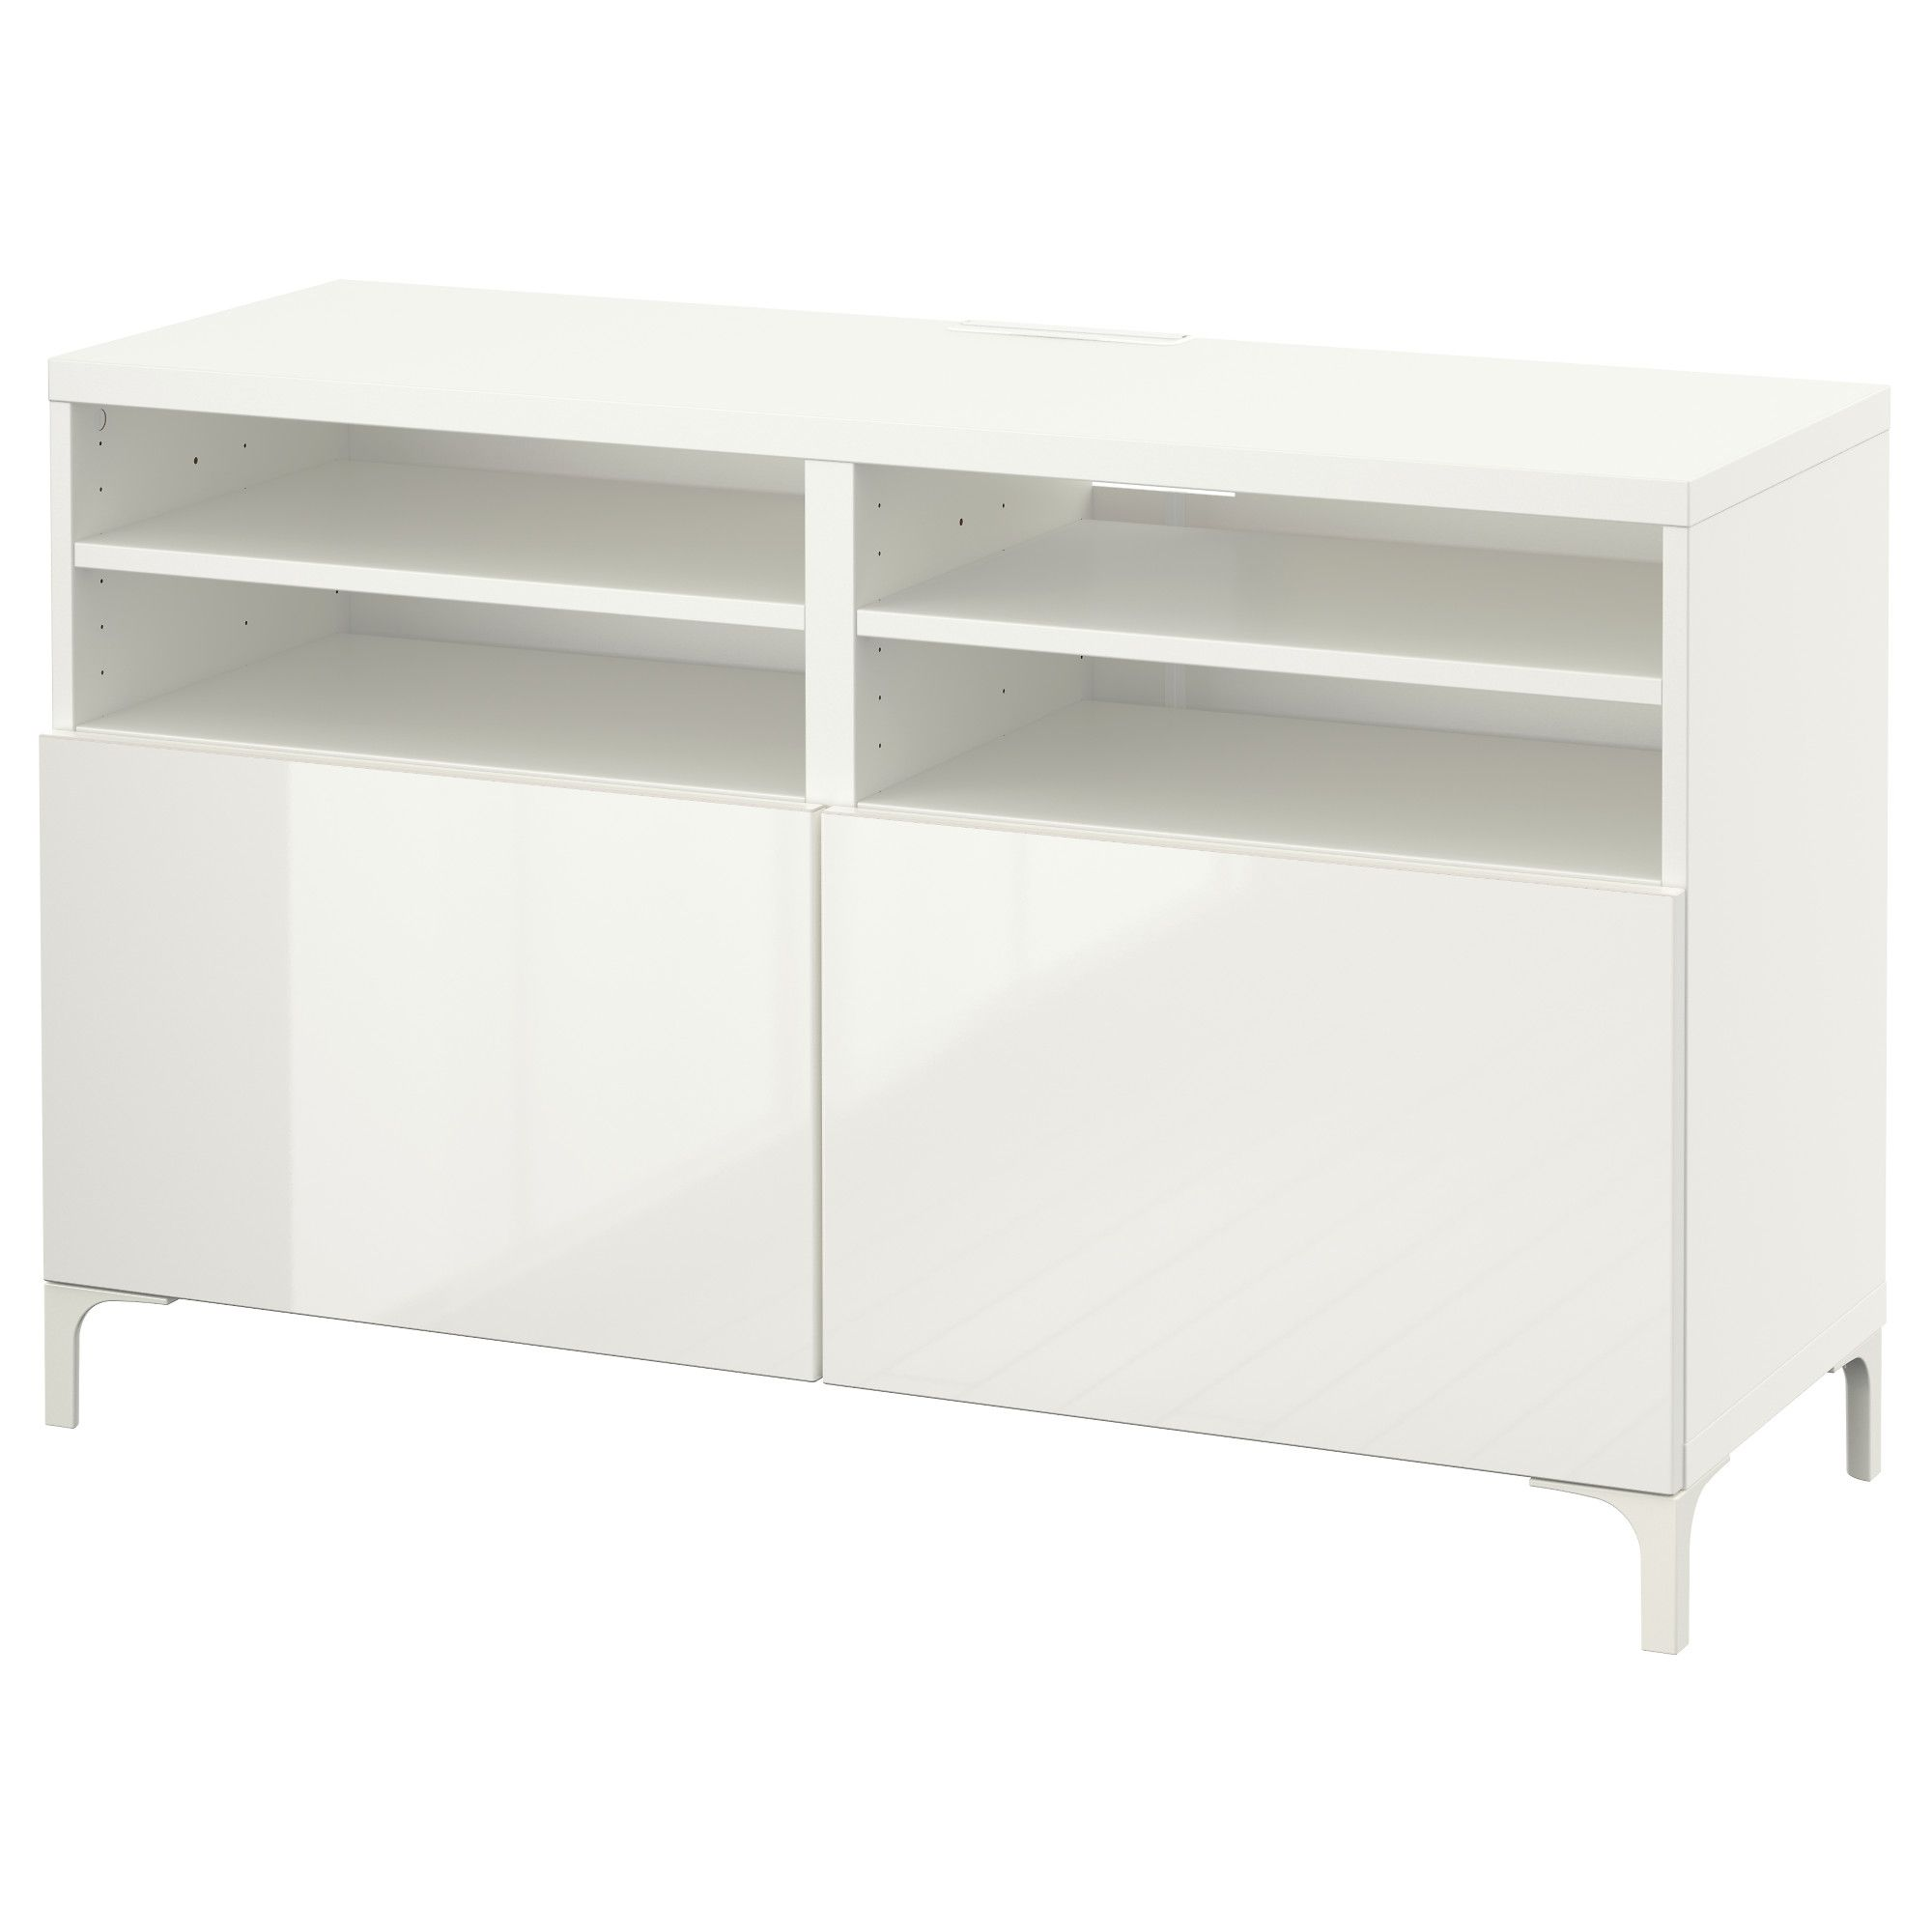 Ikea Liatorp Tv Bank Bdicte Liatorp Tv Benk